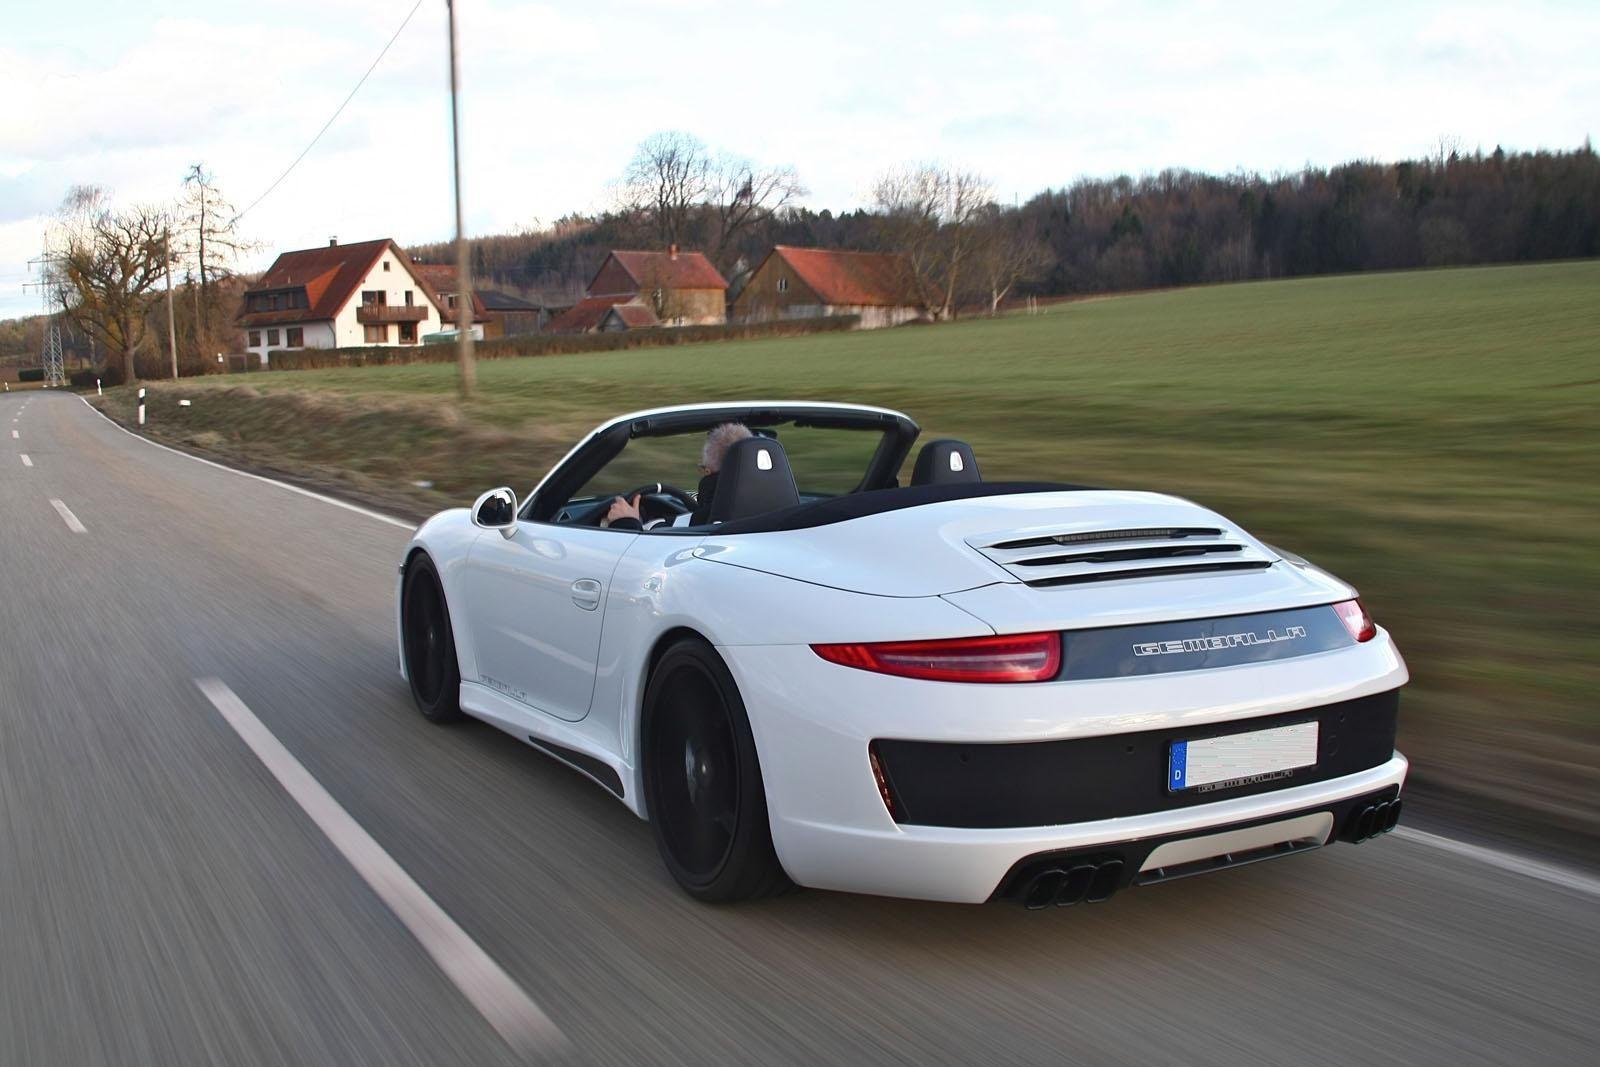 Porsche 911 carrera s cabriolet contact us on parklane car rental 971 4 347